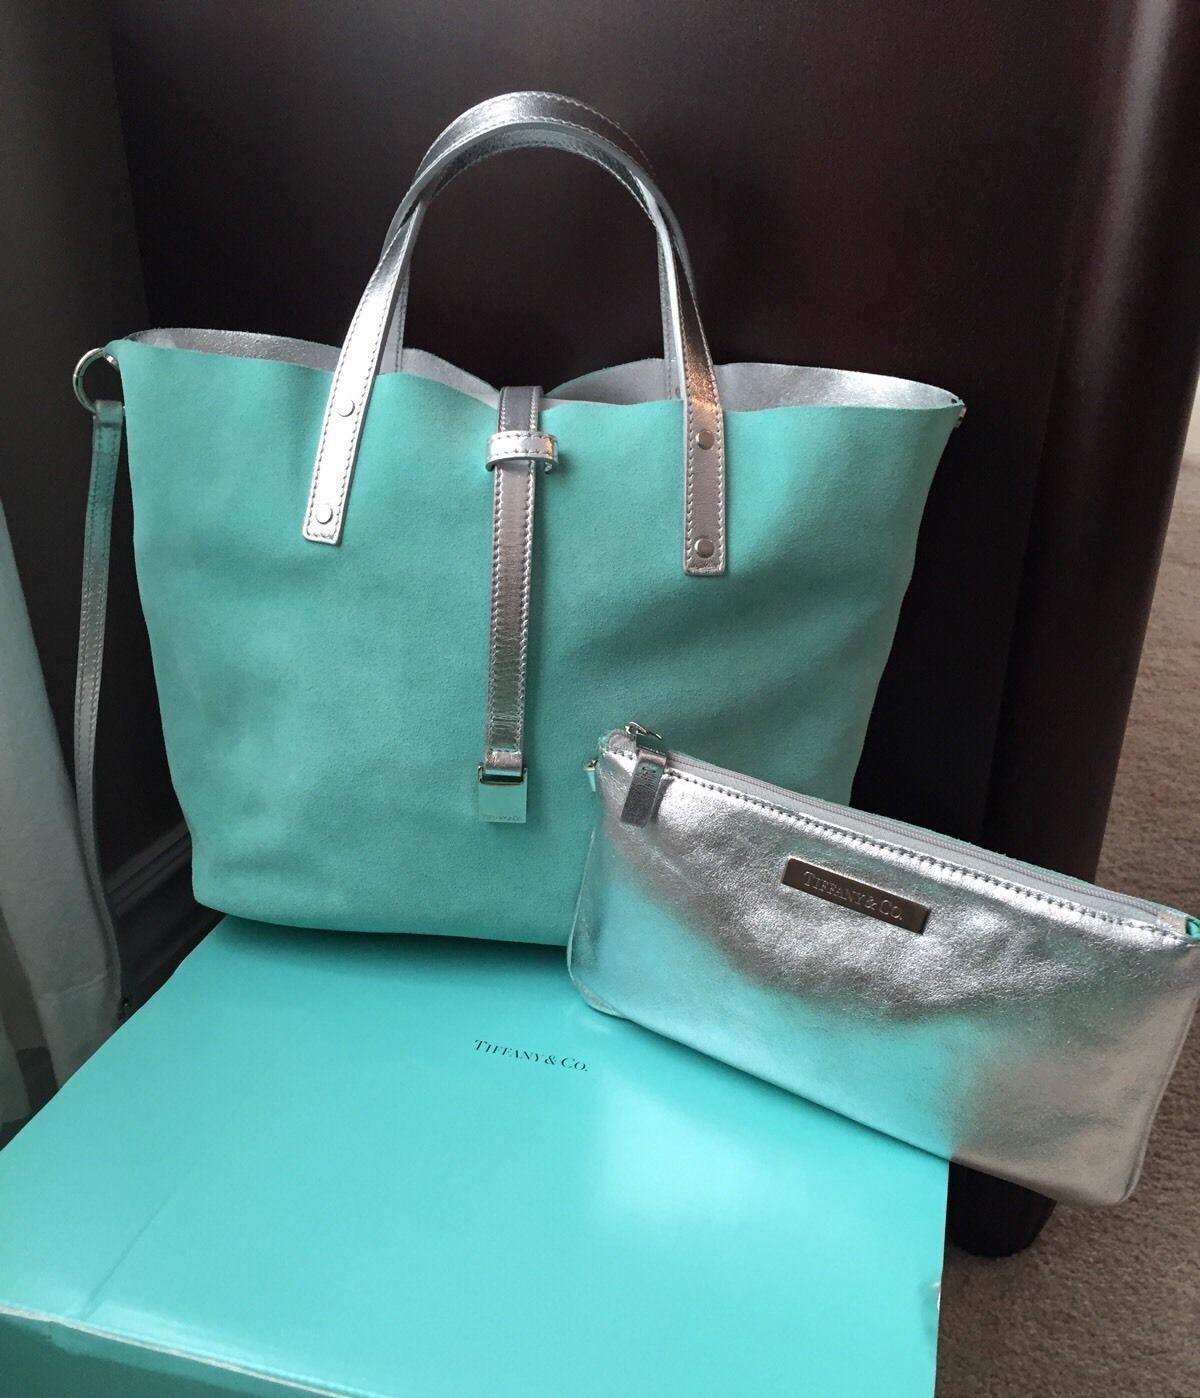 7afc5f1525 I love this mini purse--- Tiffany Co Small Blue Suede Silver Metallic  Reversible Tote Cosmetic Case | eBay #tiffany #taffanyblue #purse #fashion  #luxury